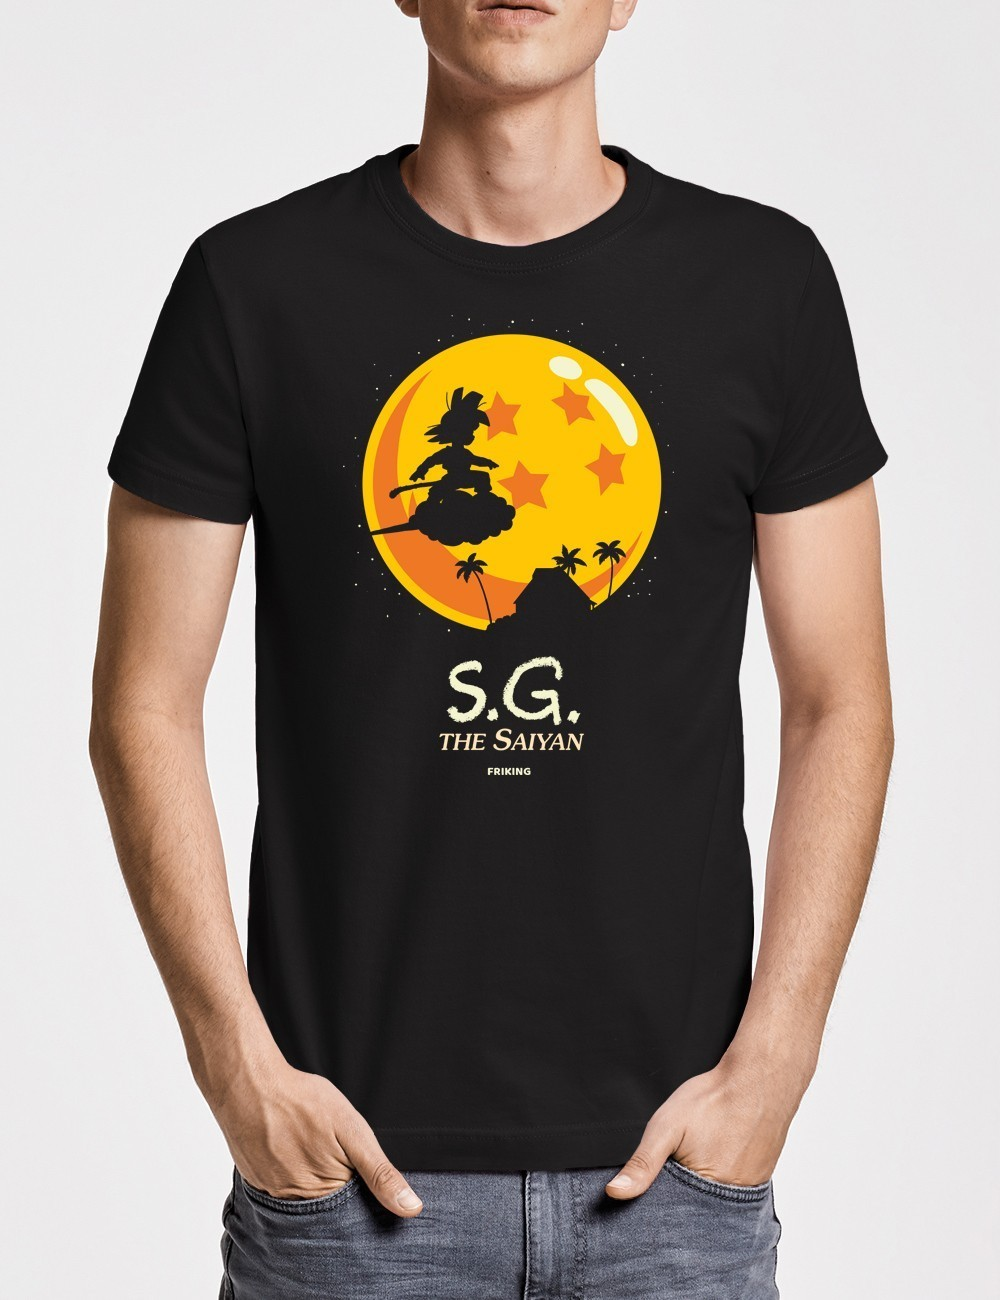 S.G the saiyan